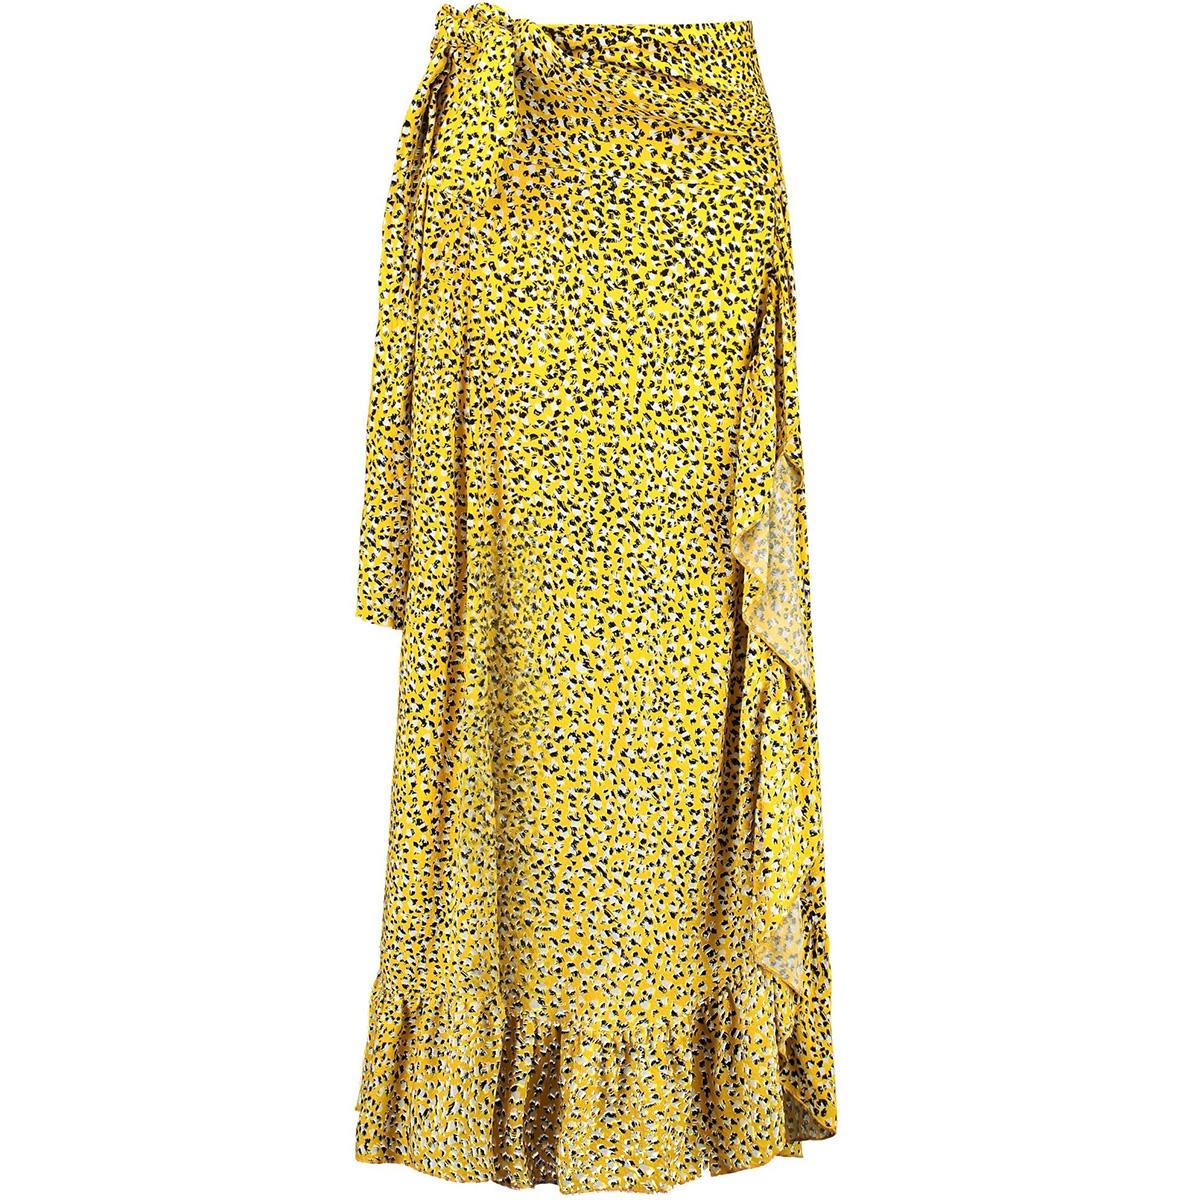 gele rok met ruffles e90120 garcia rok 3065 sulphur